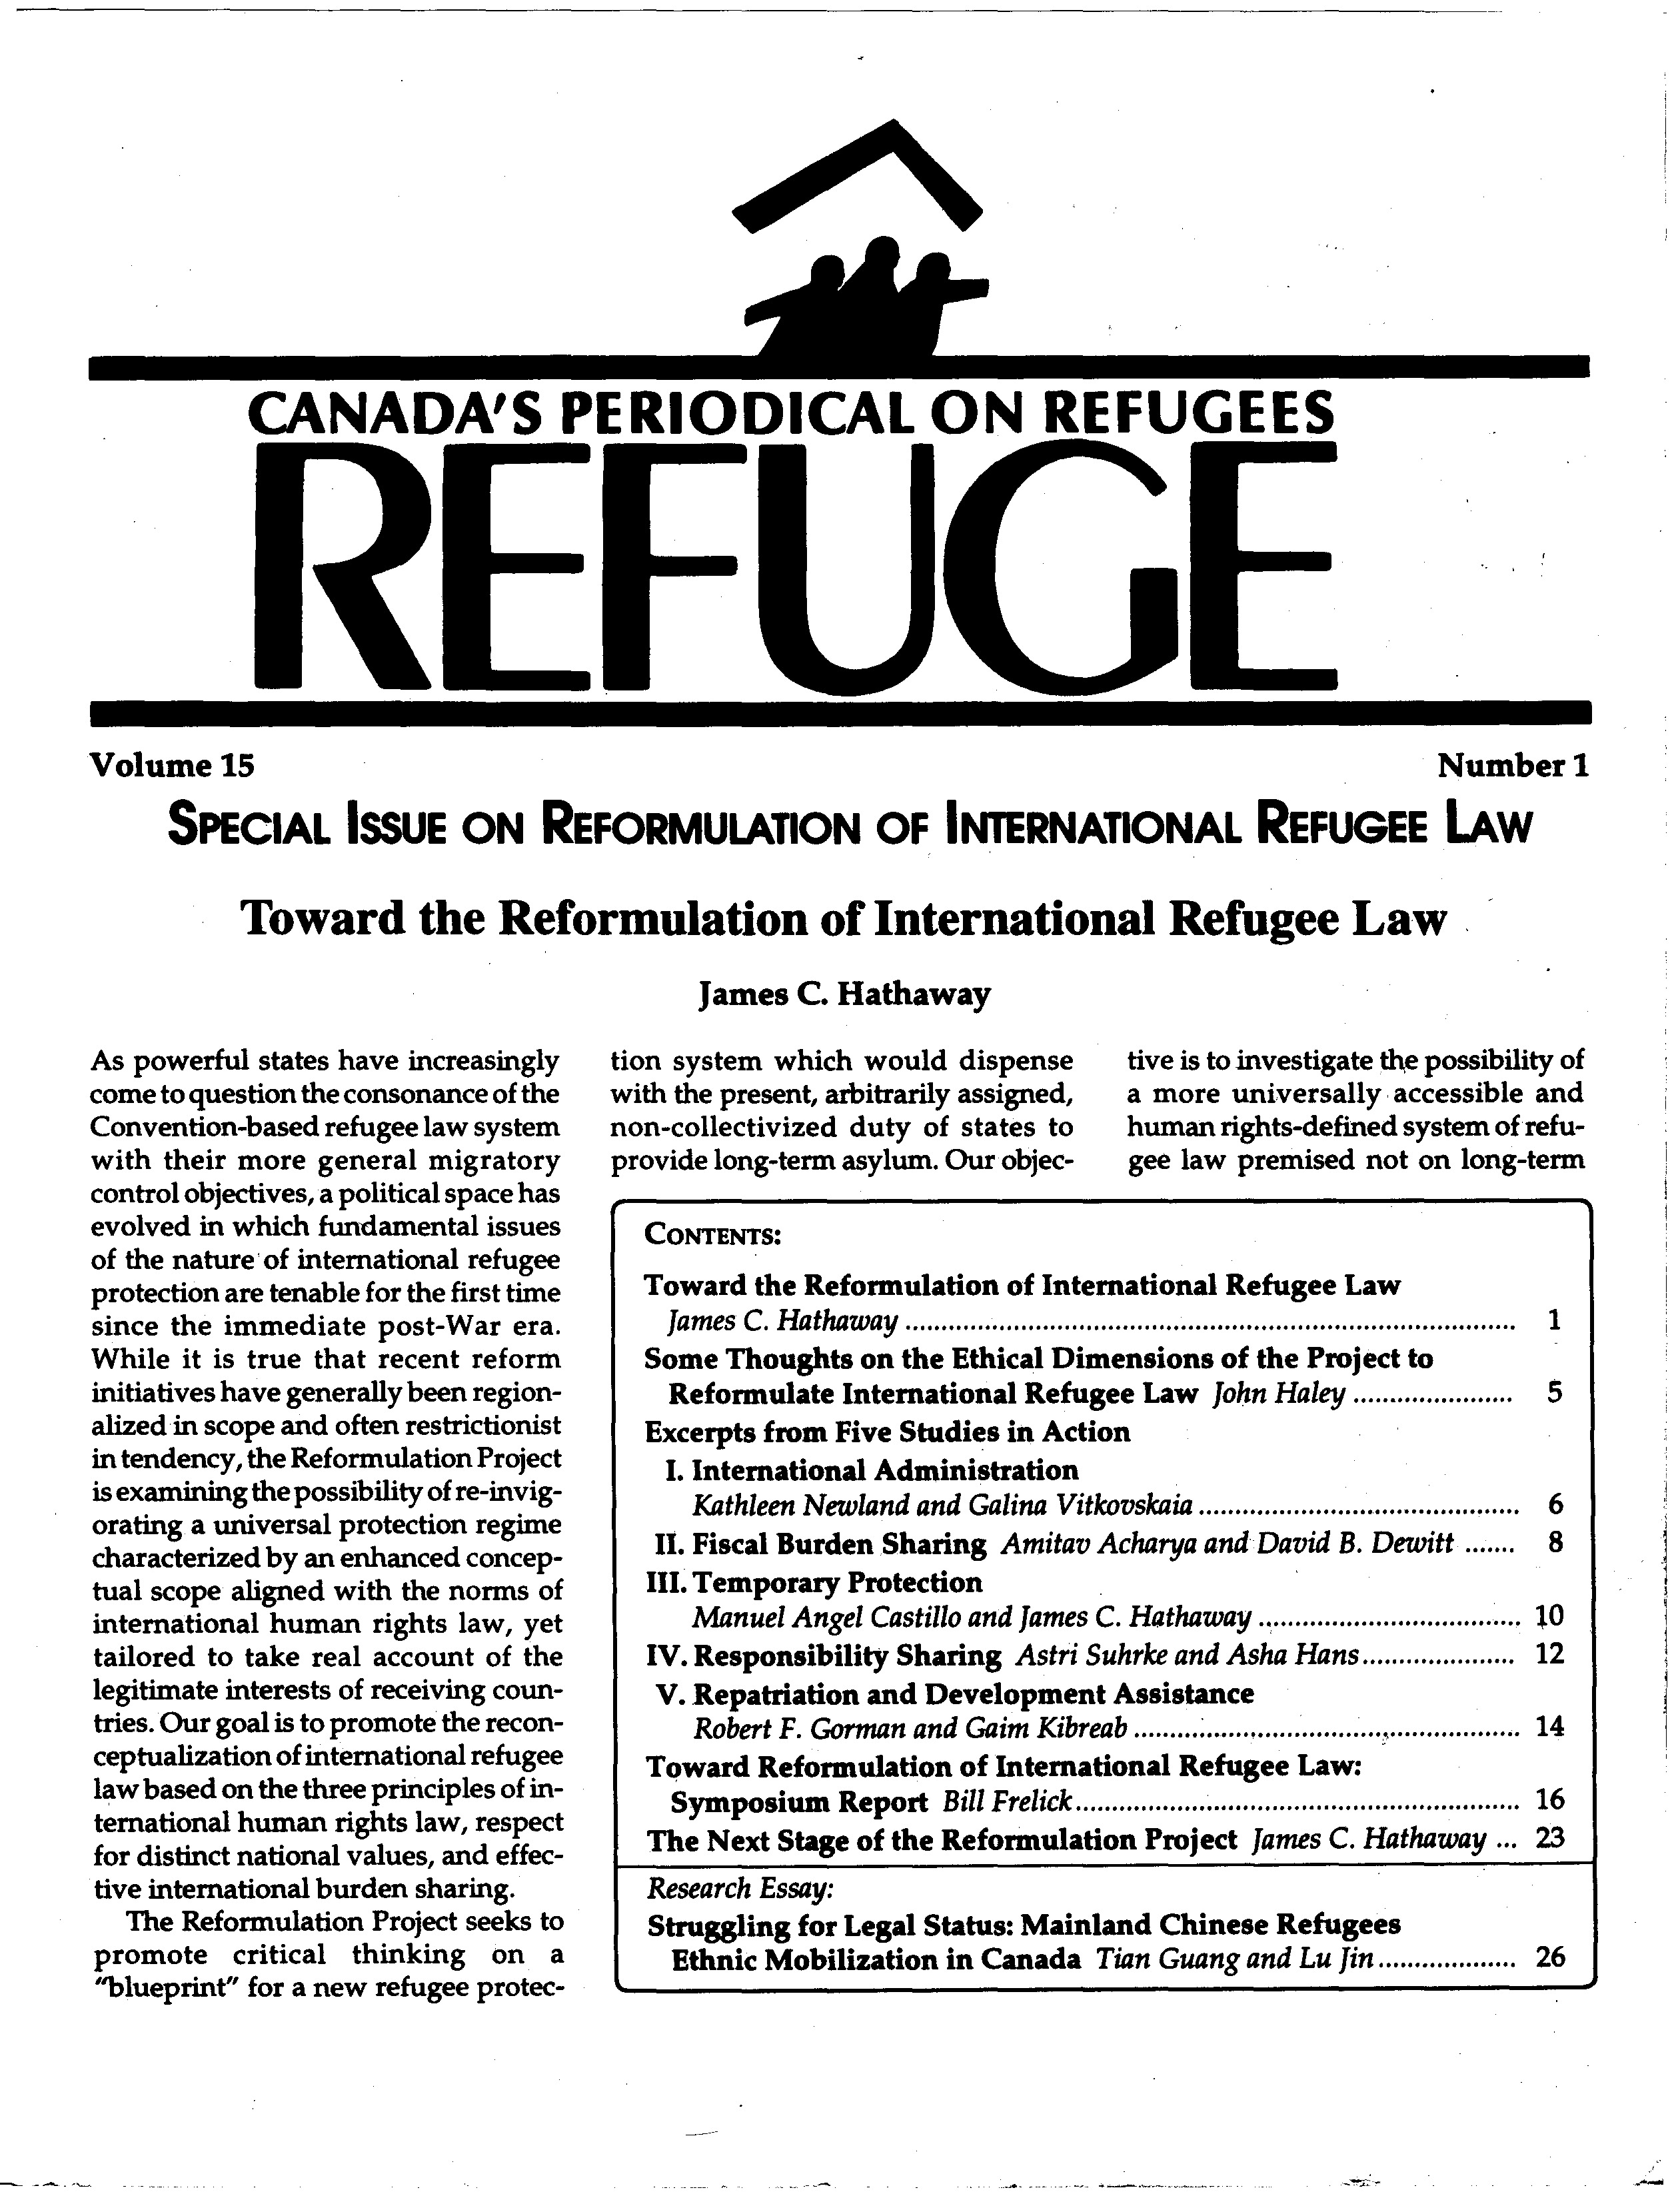 first page Refuge vol. 15.1 1996